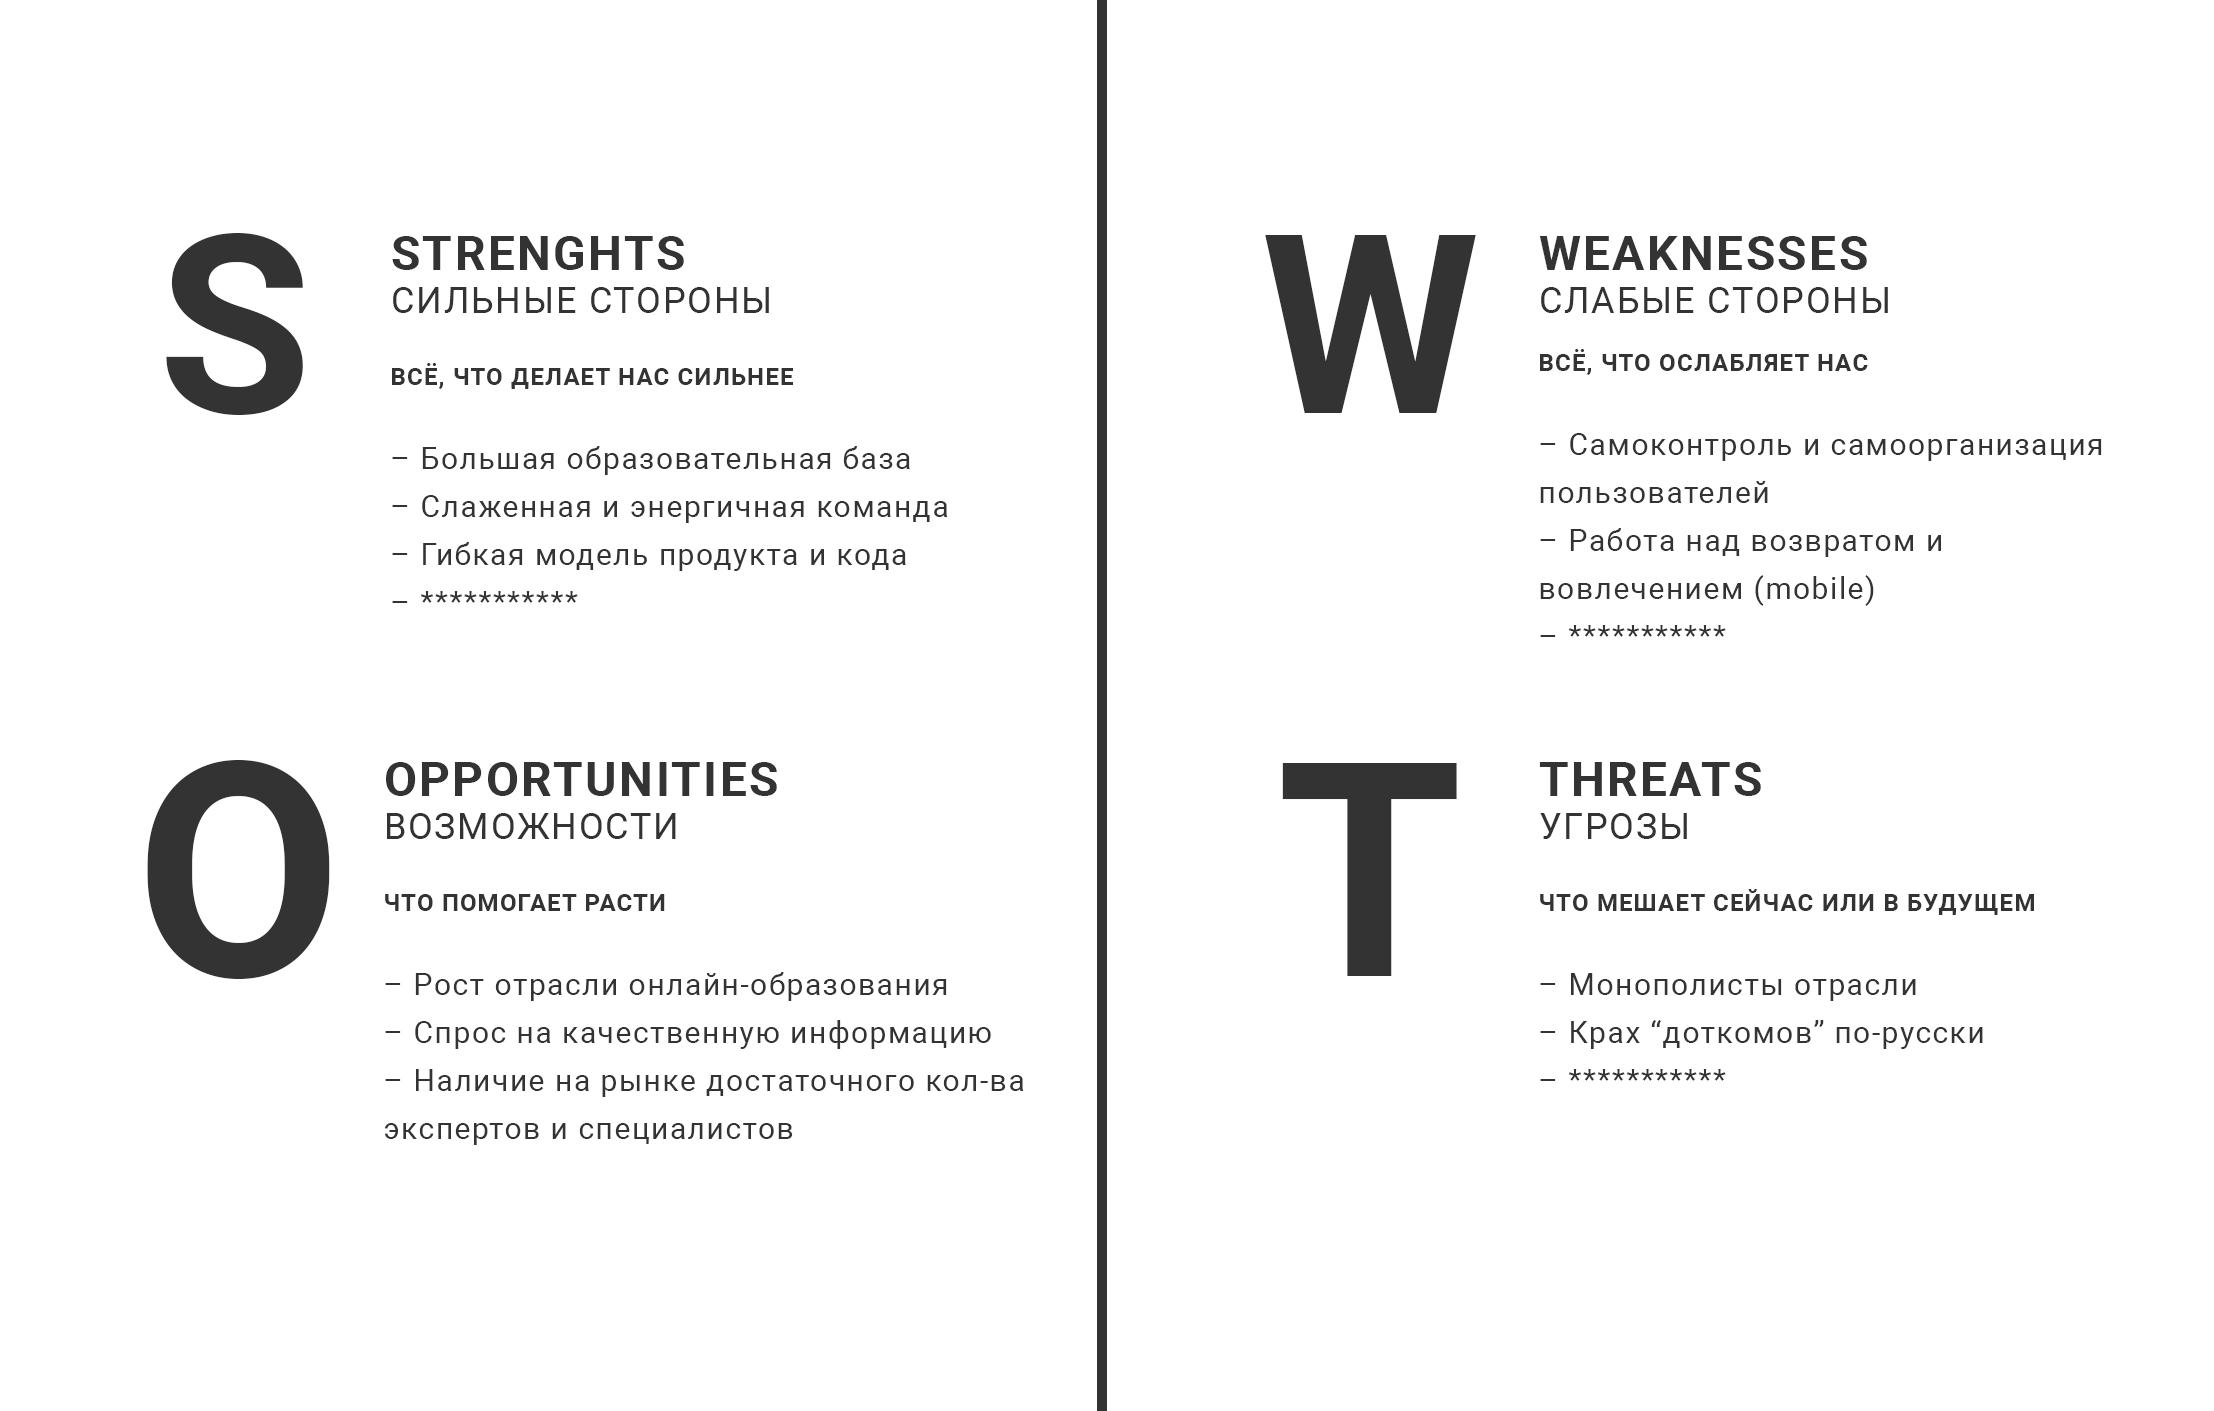 Собираемся с мыслями при помощи методологии SWOT